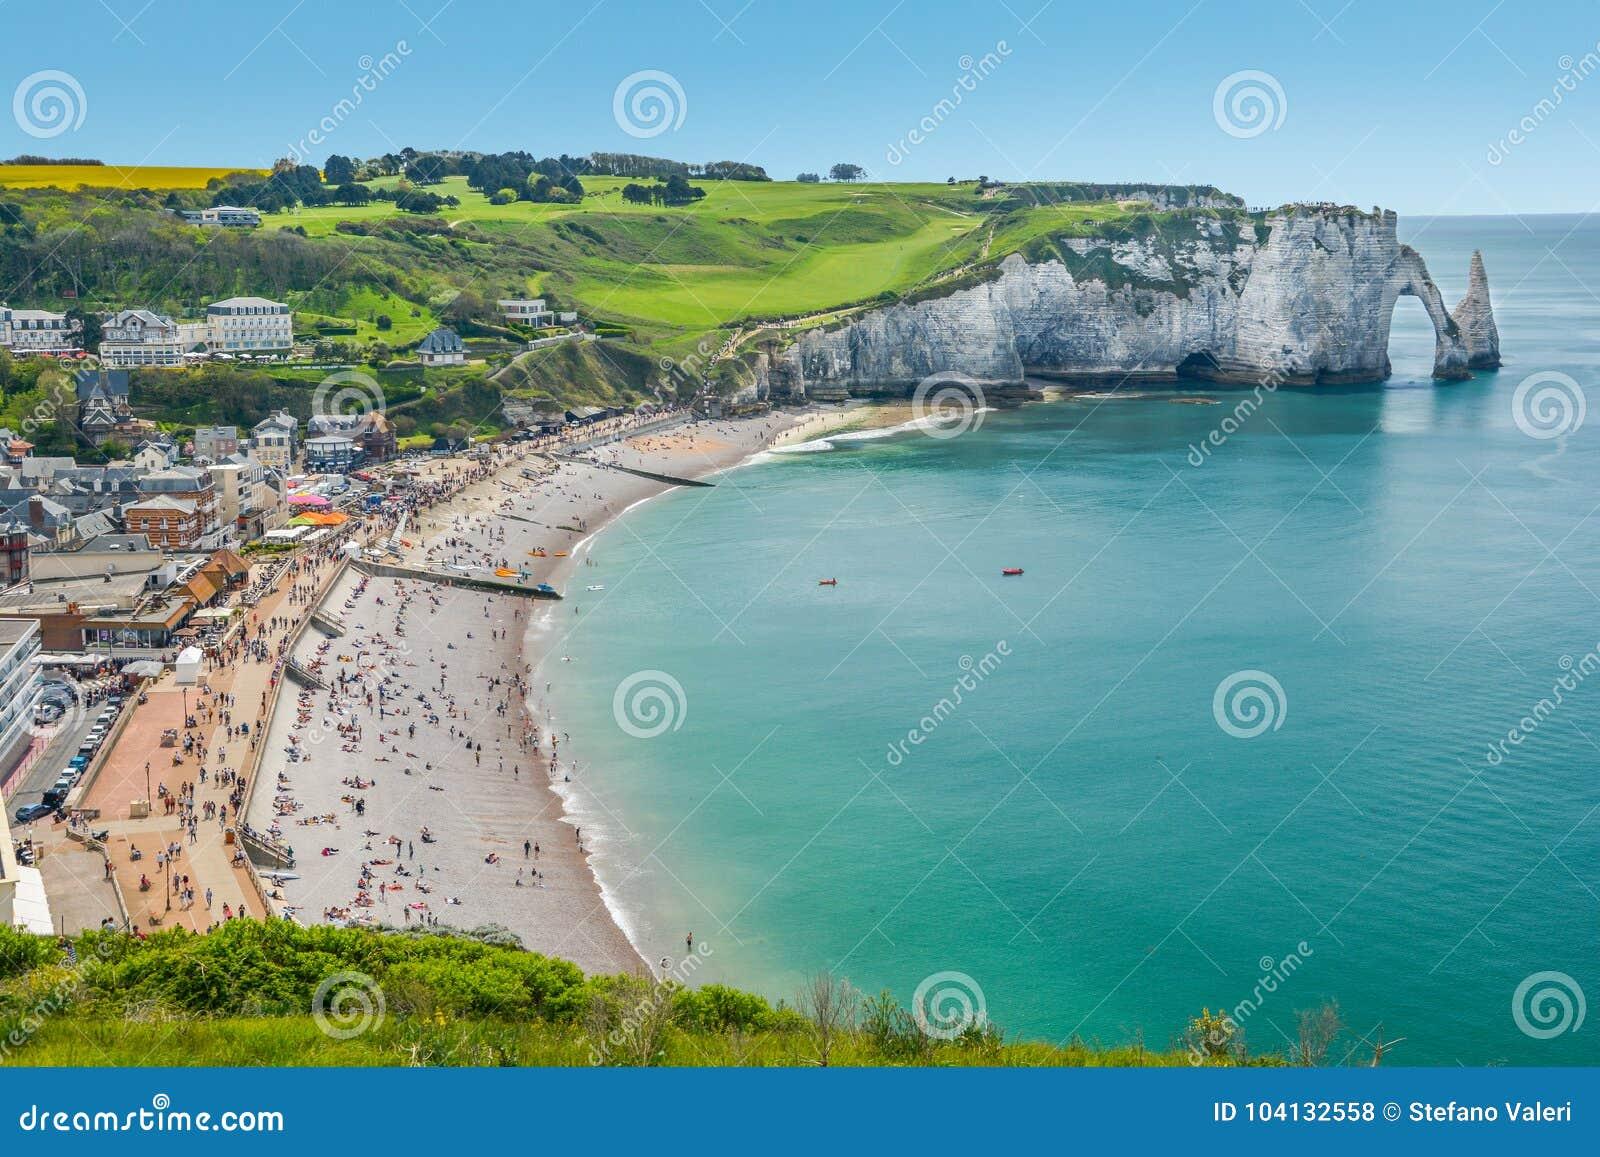 De Albasten Kust van Etretat, Normandië, Frankrijk